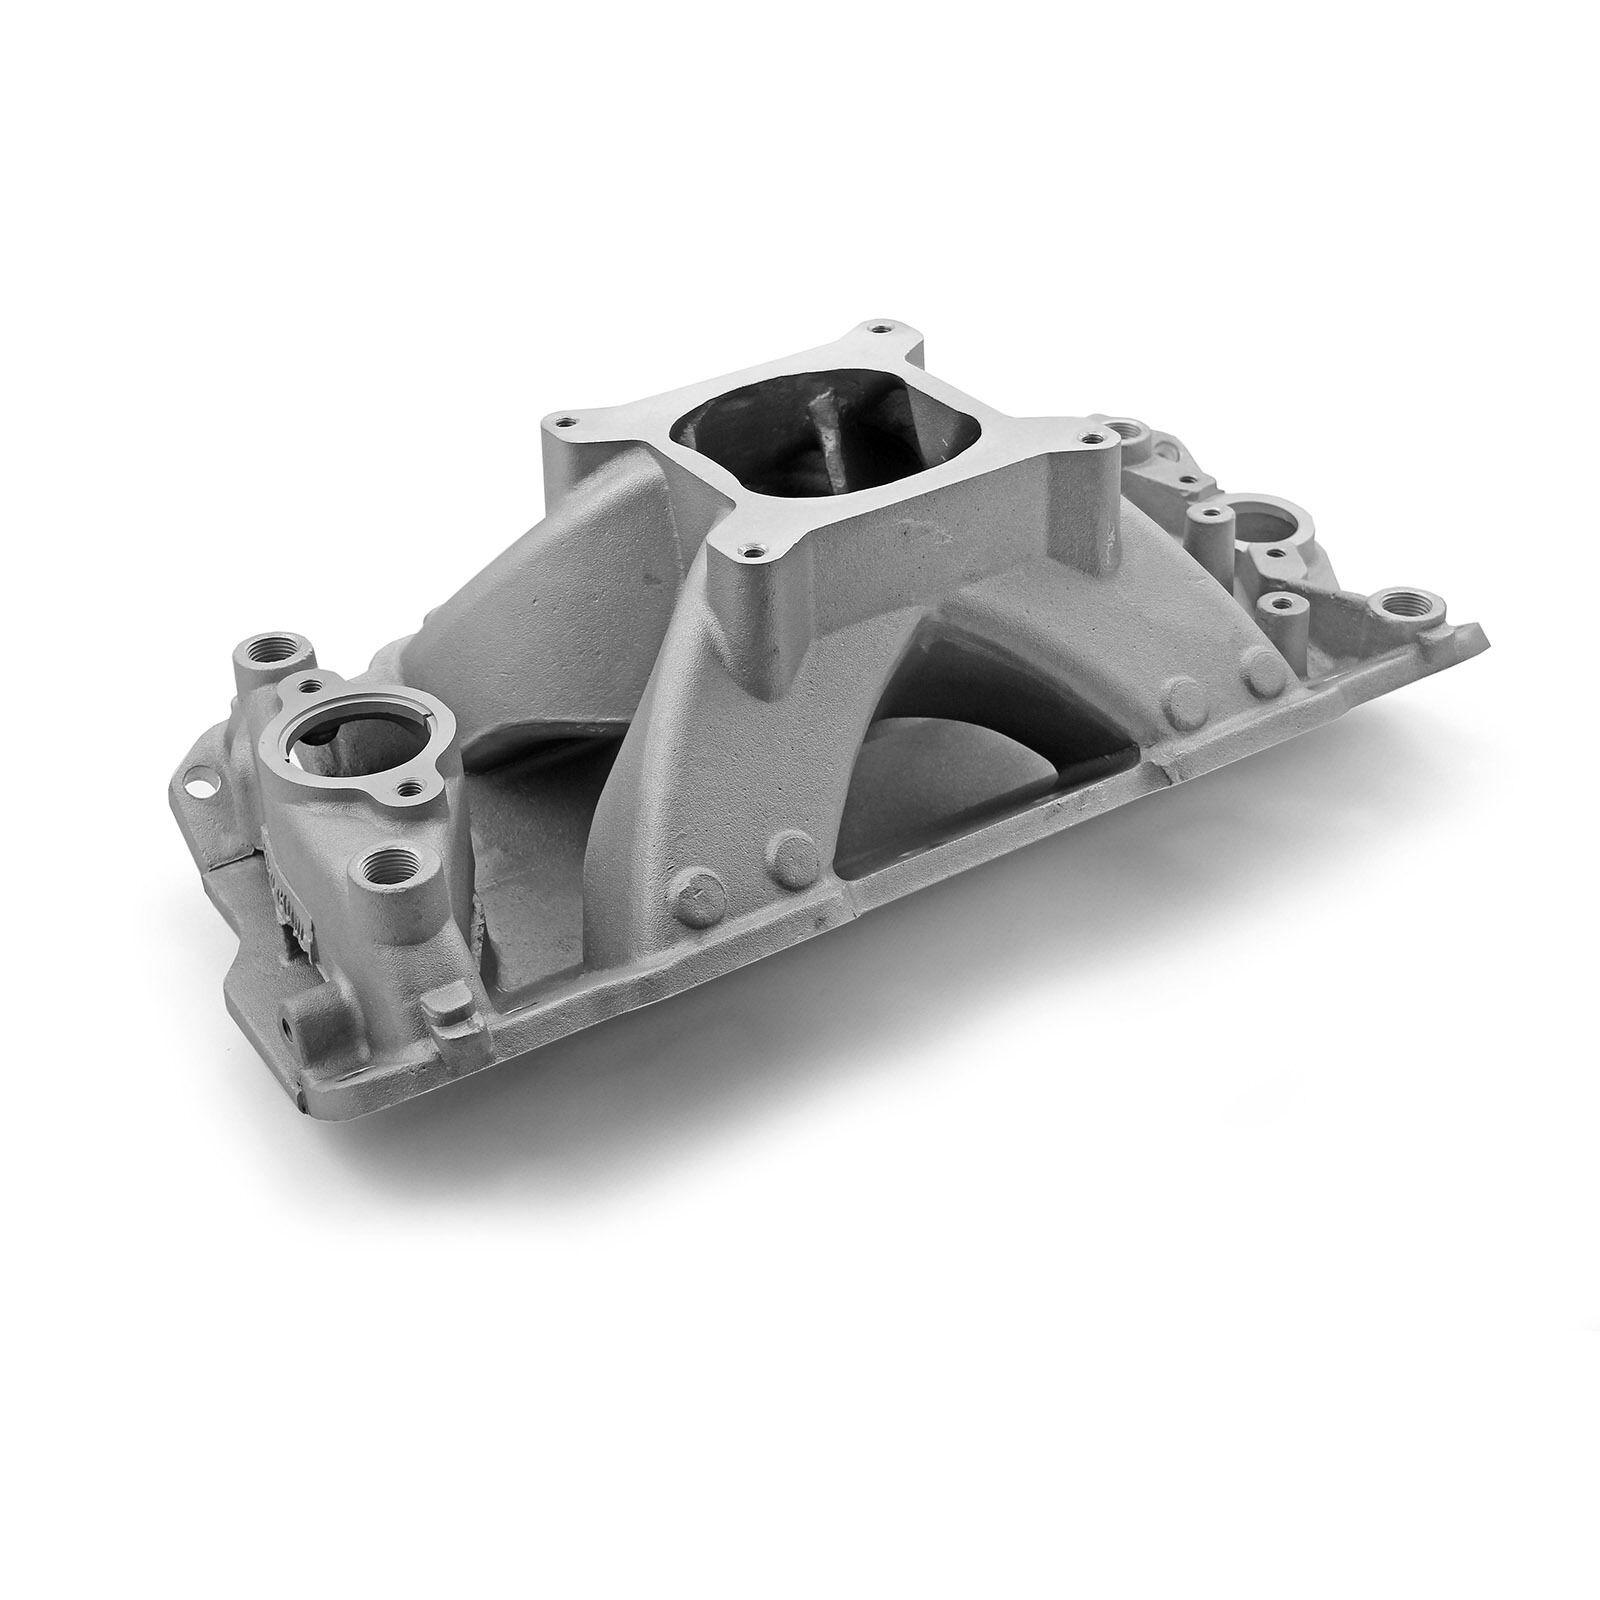 SBC SMALL BLOCK CHEVY Scorpion Aluminum Intake Satin 350